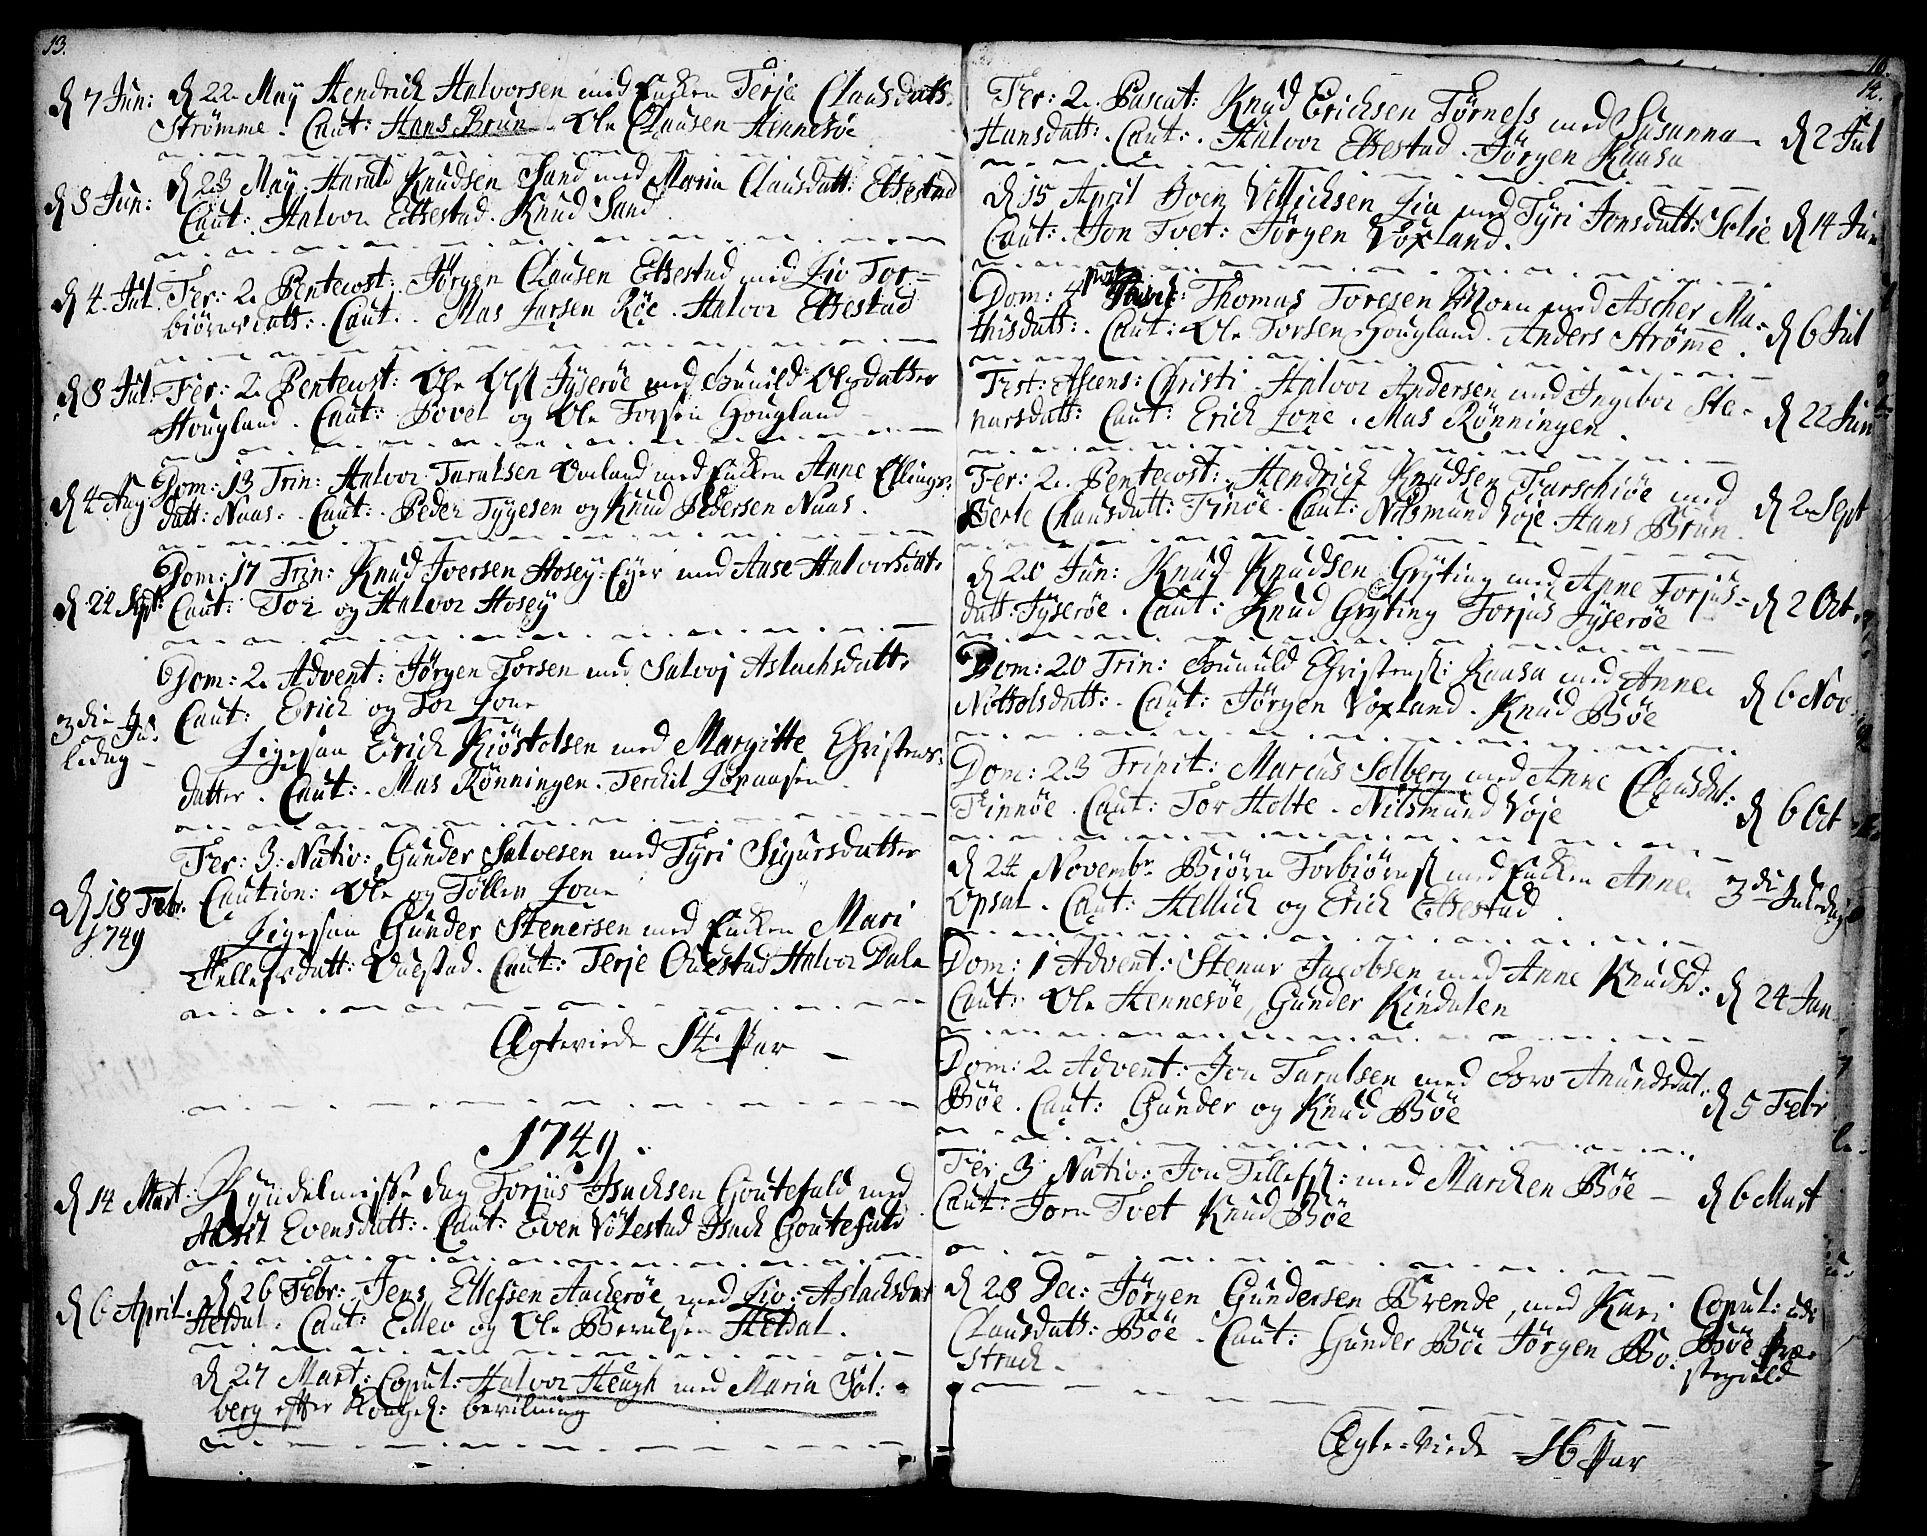 SAKO, Drangedal kirkebøker, F/Fa/L0001: Ministerialbok nr. 1, 1697-1767, s. 13-14